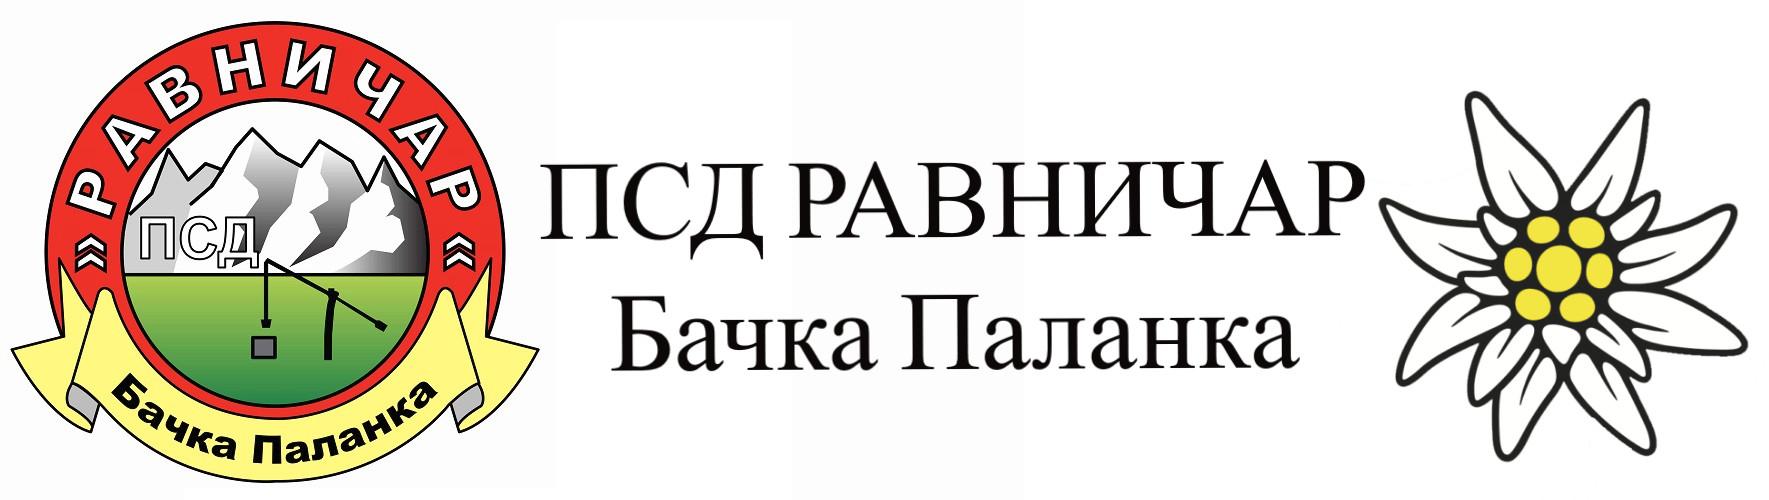 PSD RAVNIČAR